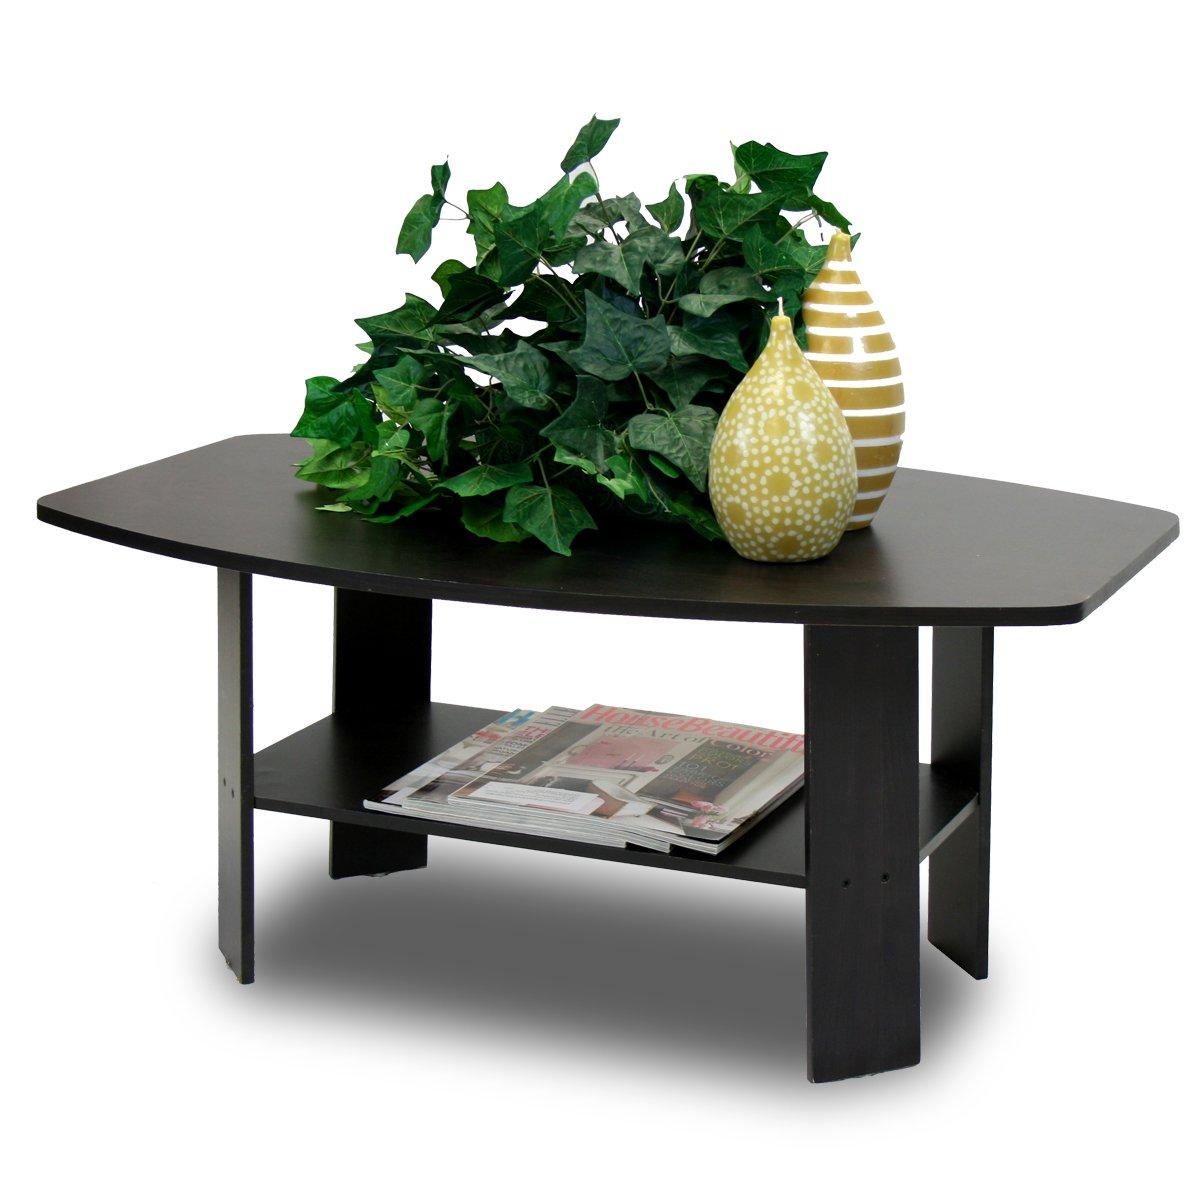 Amazon.com: Living Room Furniture : Home & Kitchen title=